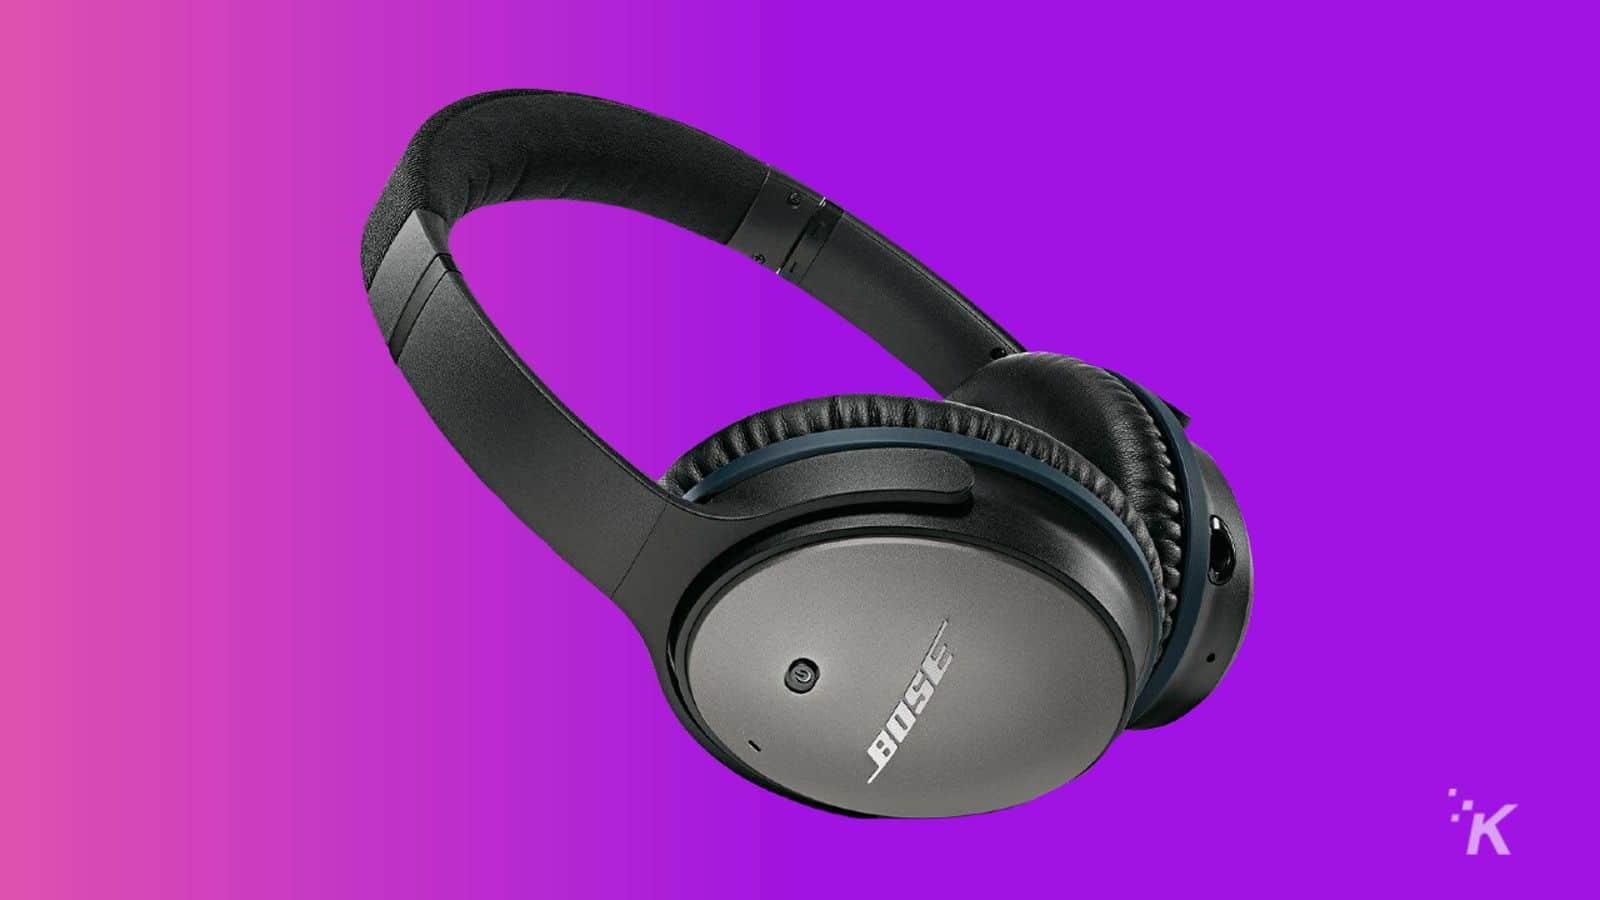 bose anc headphones